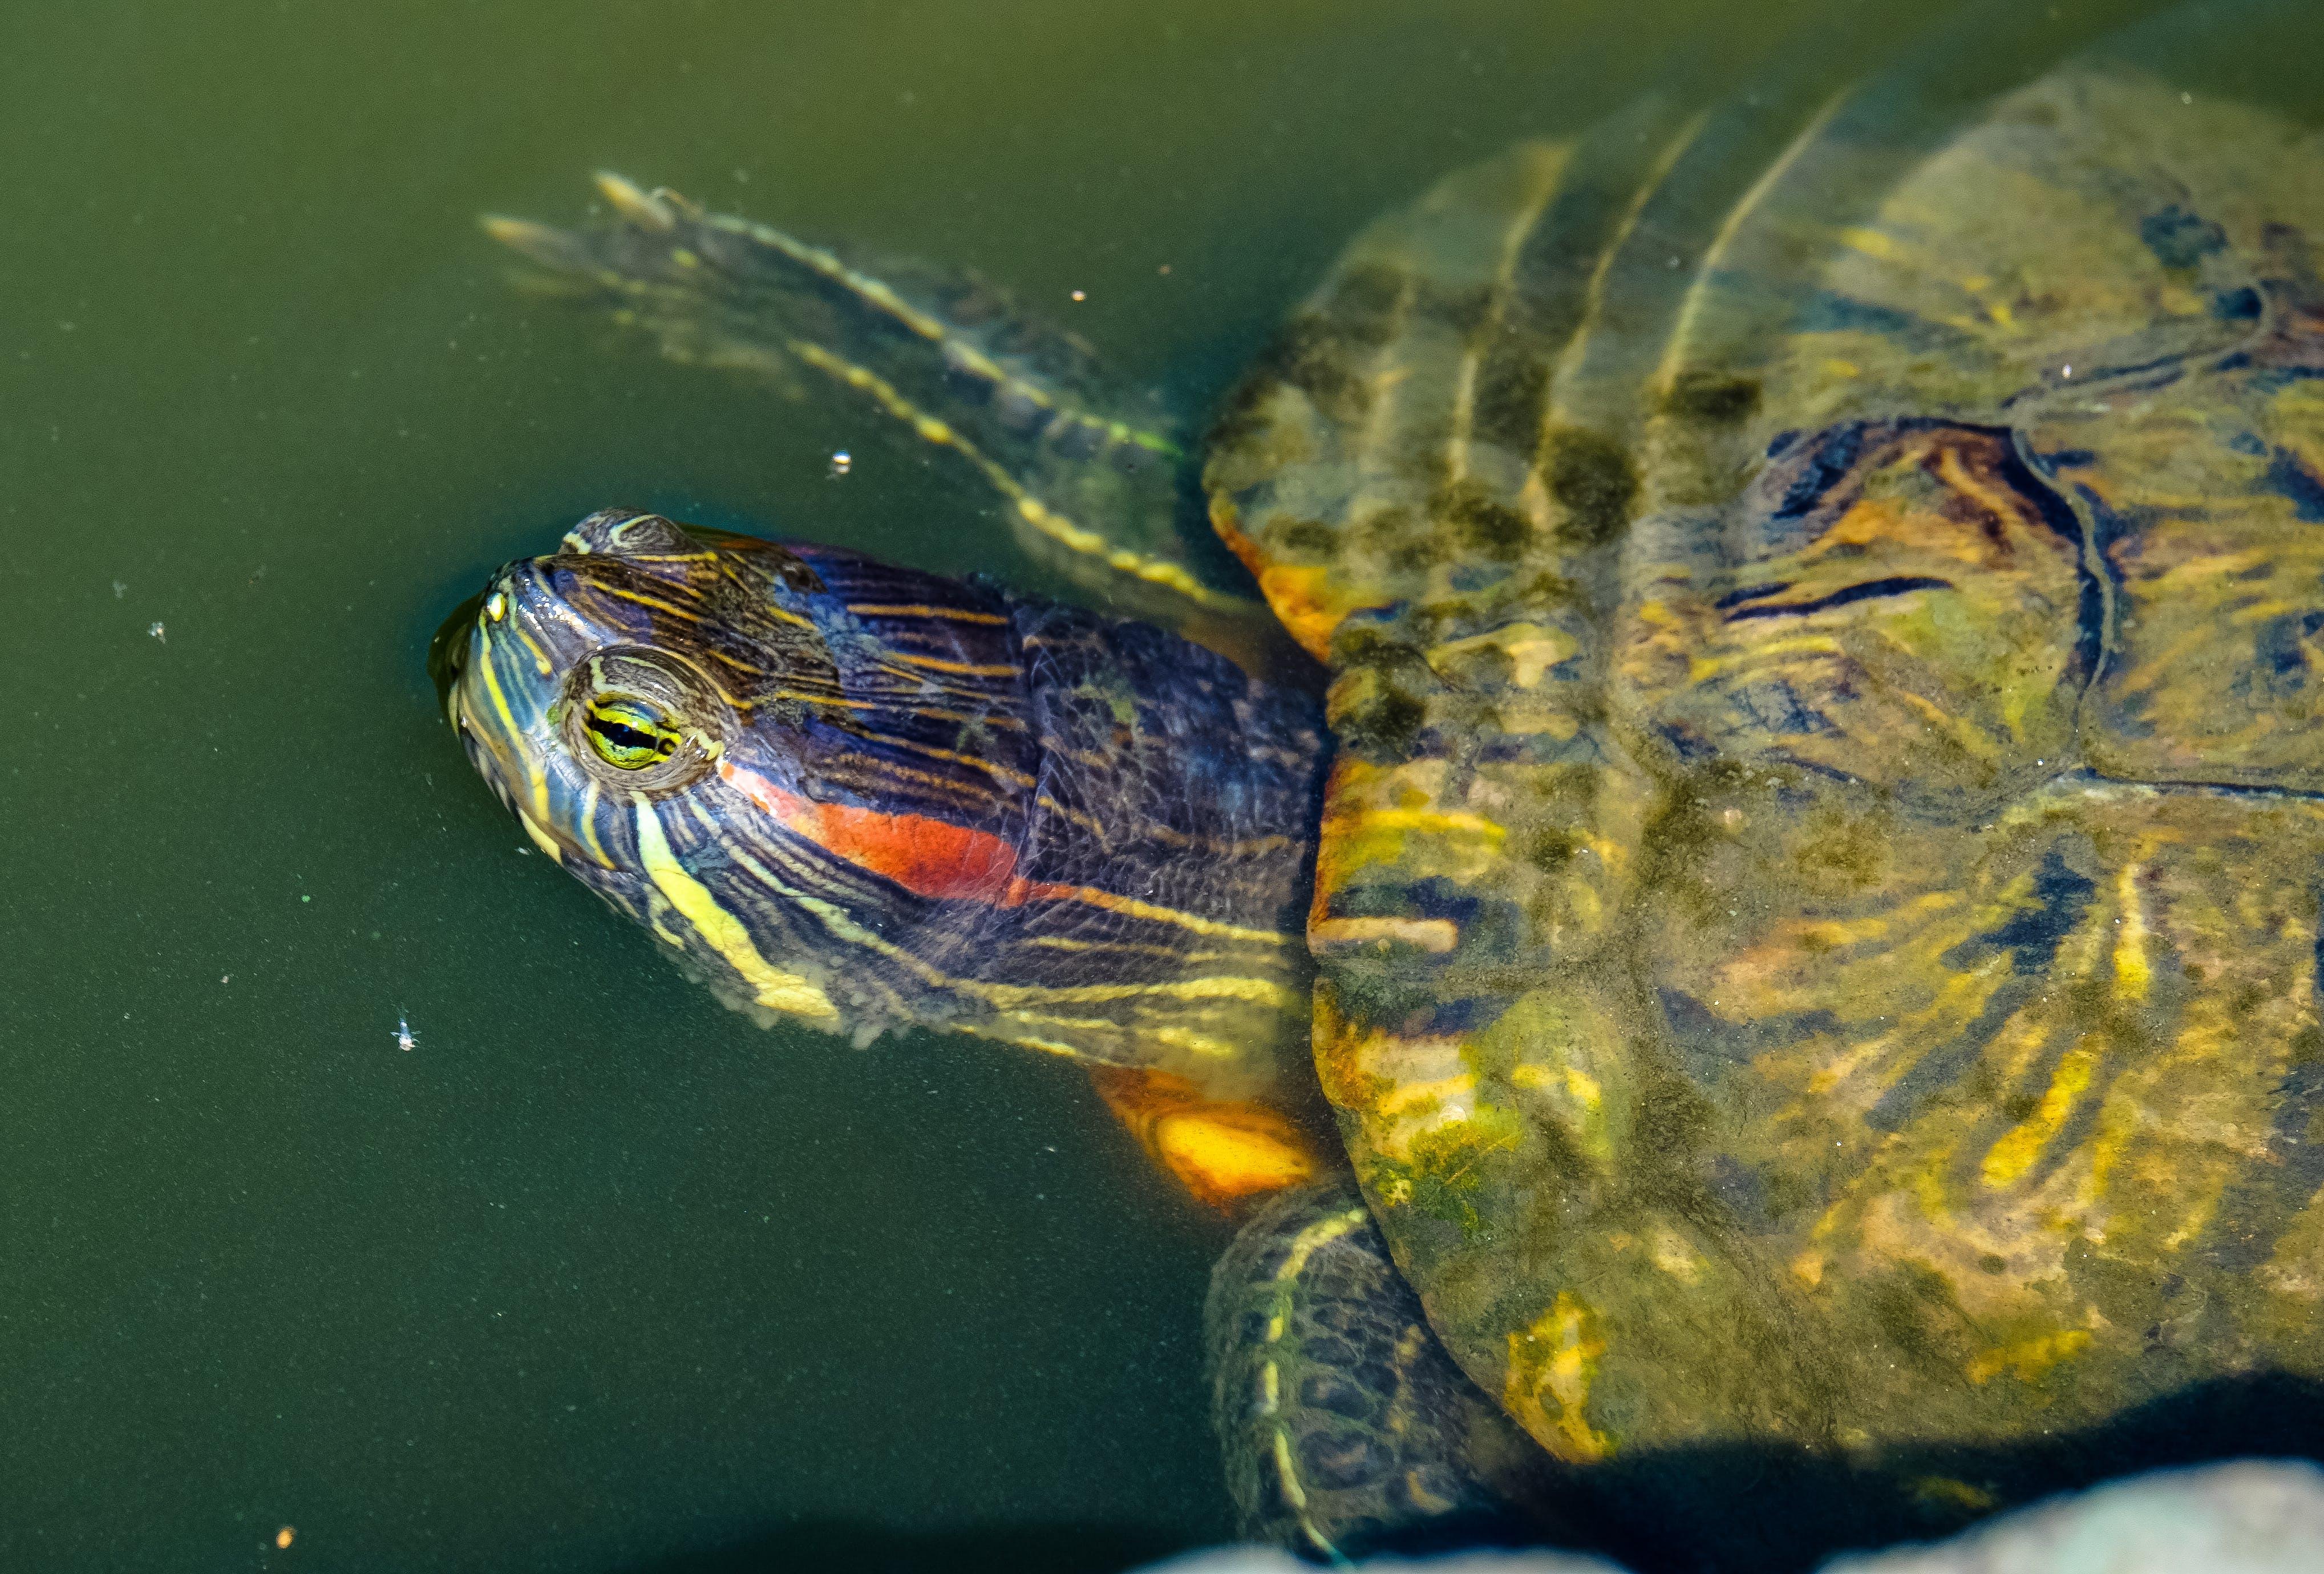 animal, aquatic, close -up